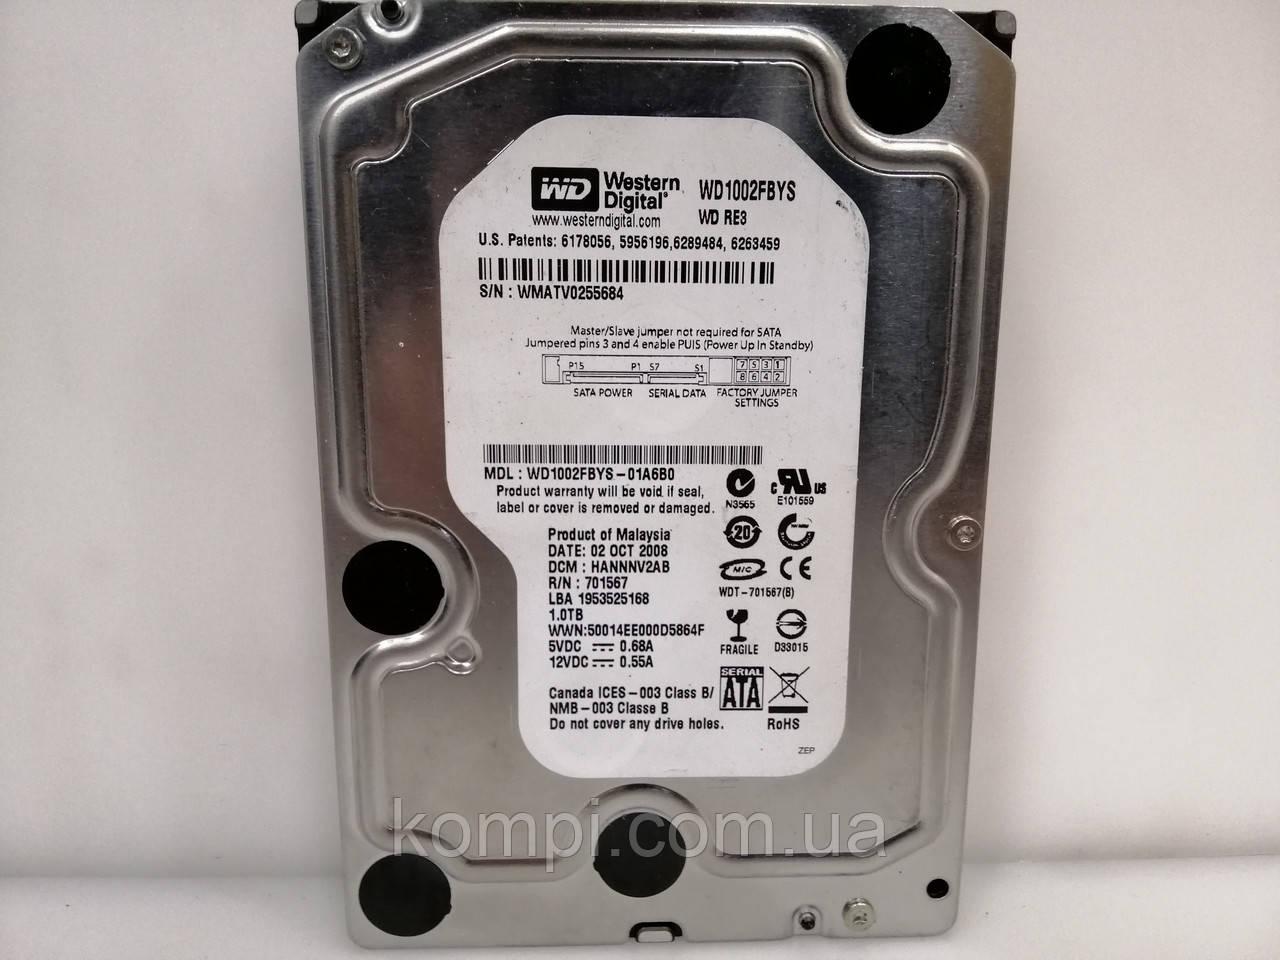 HDD Жорсткий диск Western Digital RE3 1TB 7200rpm 32MB WD1002FBYS 3.5 SATA II  для ПК ІДЕАЛЬНИЙ СТАН